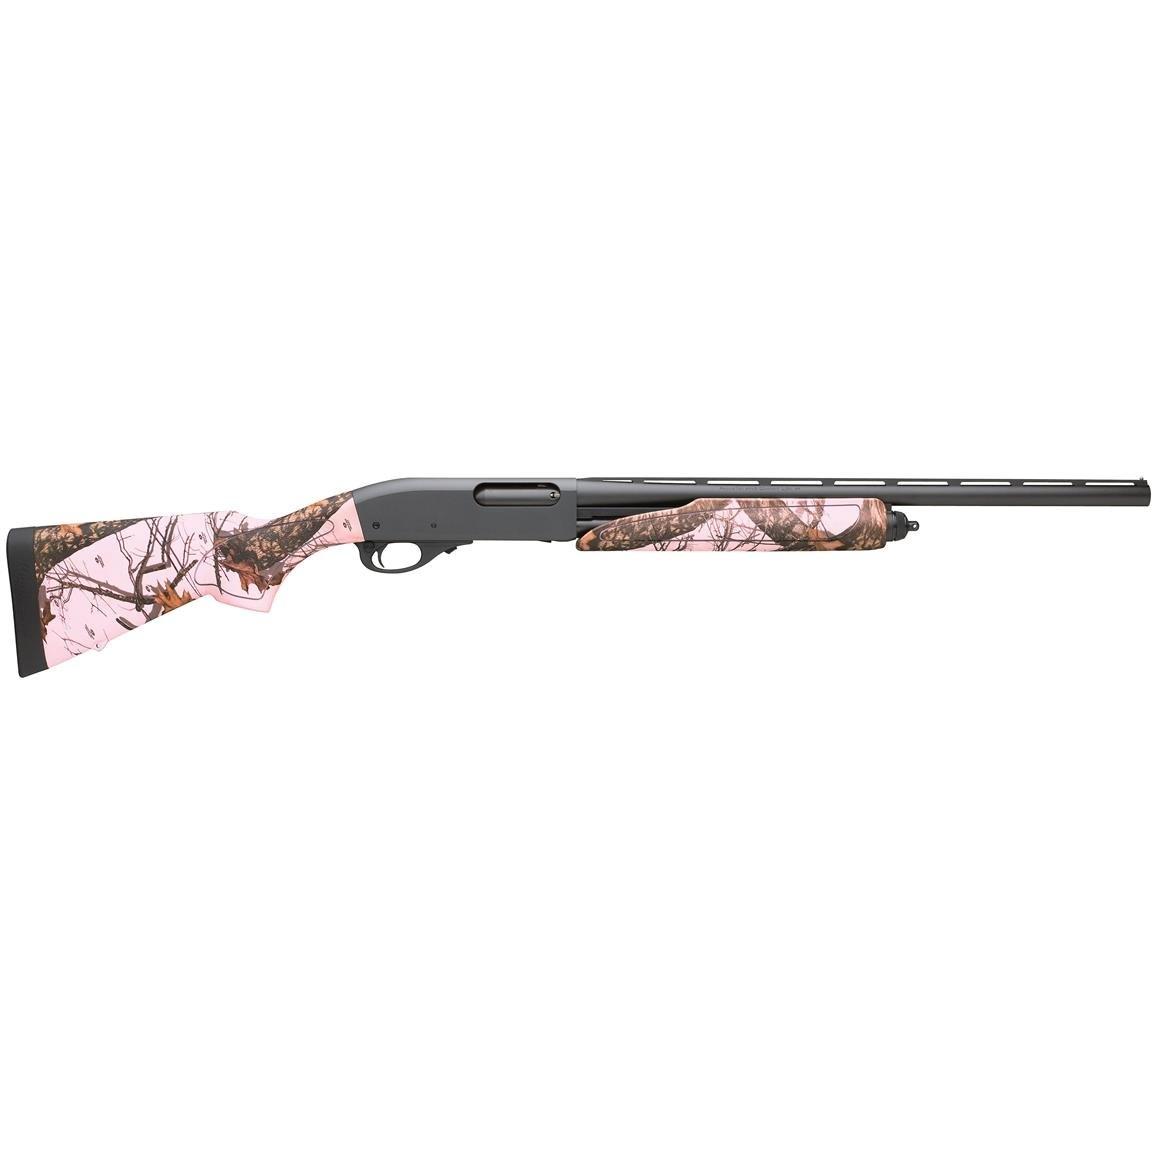 "Remington Remington 870 Compact 20 Gauge 3"" Chamber 28"" Barrel Pink Mossy Oak Camo"